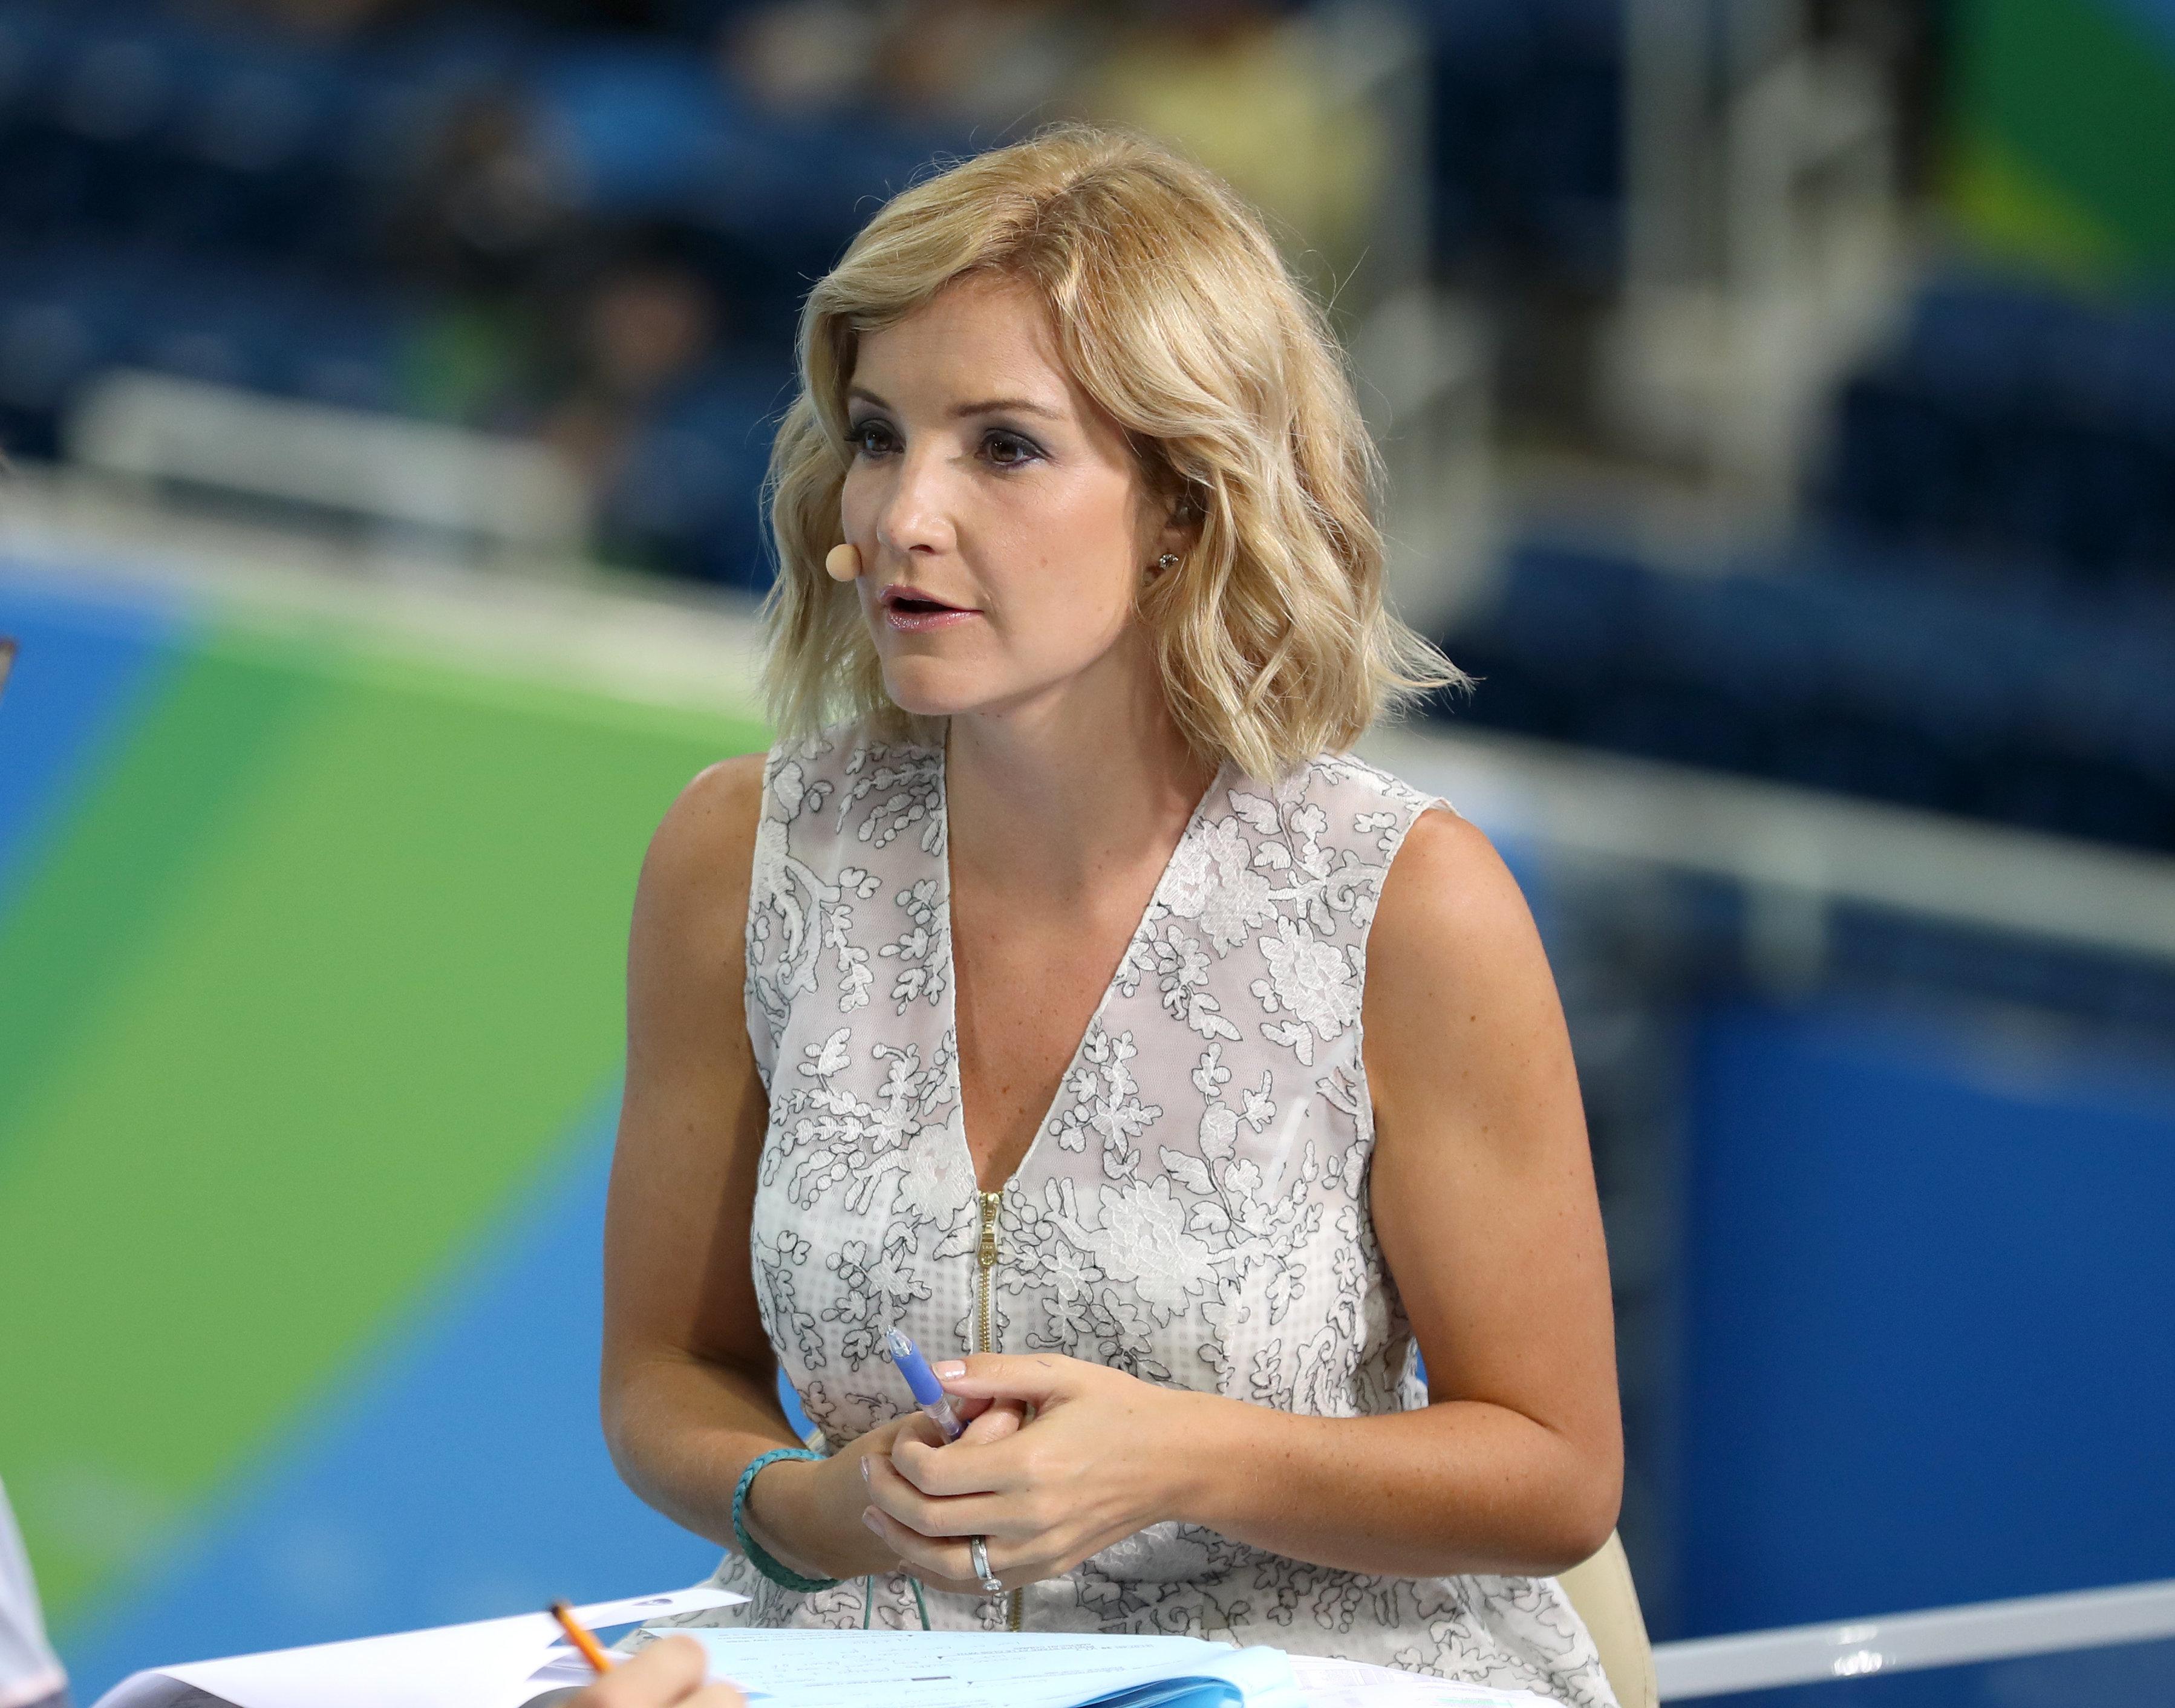 Helen Skelton is set to host